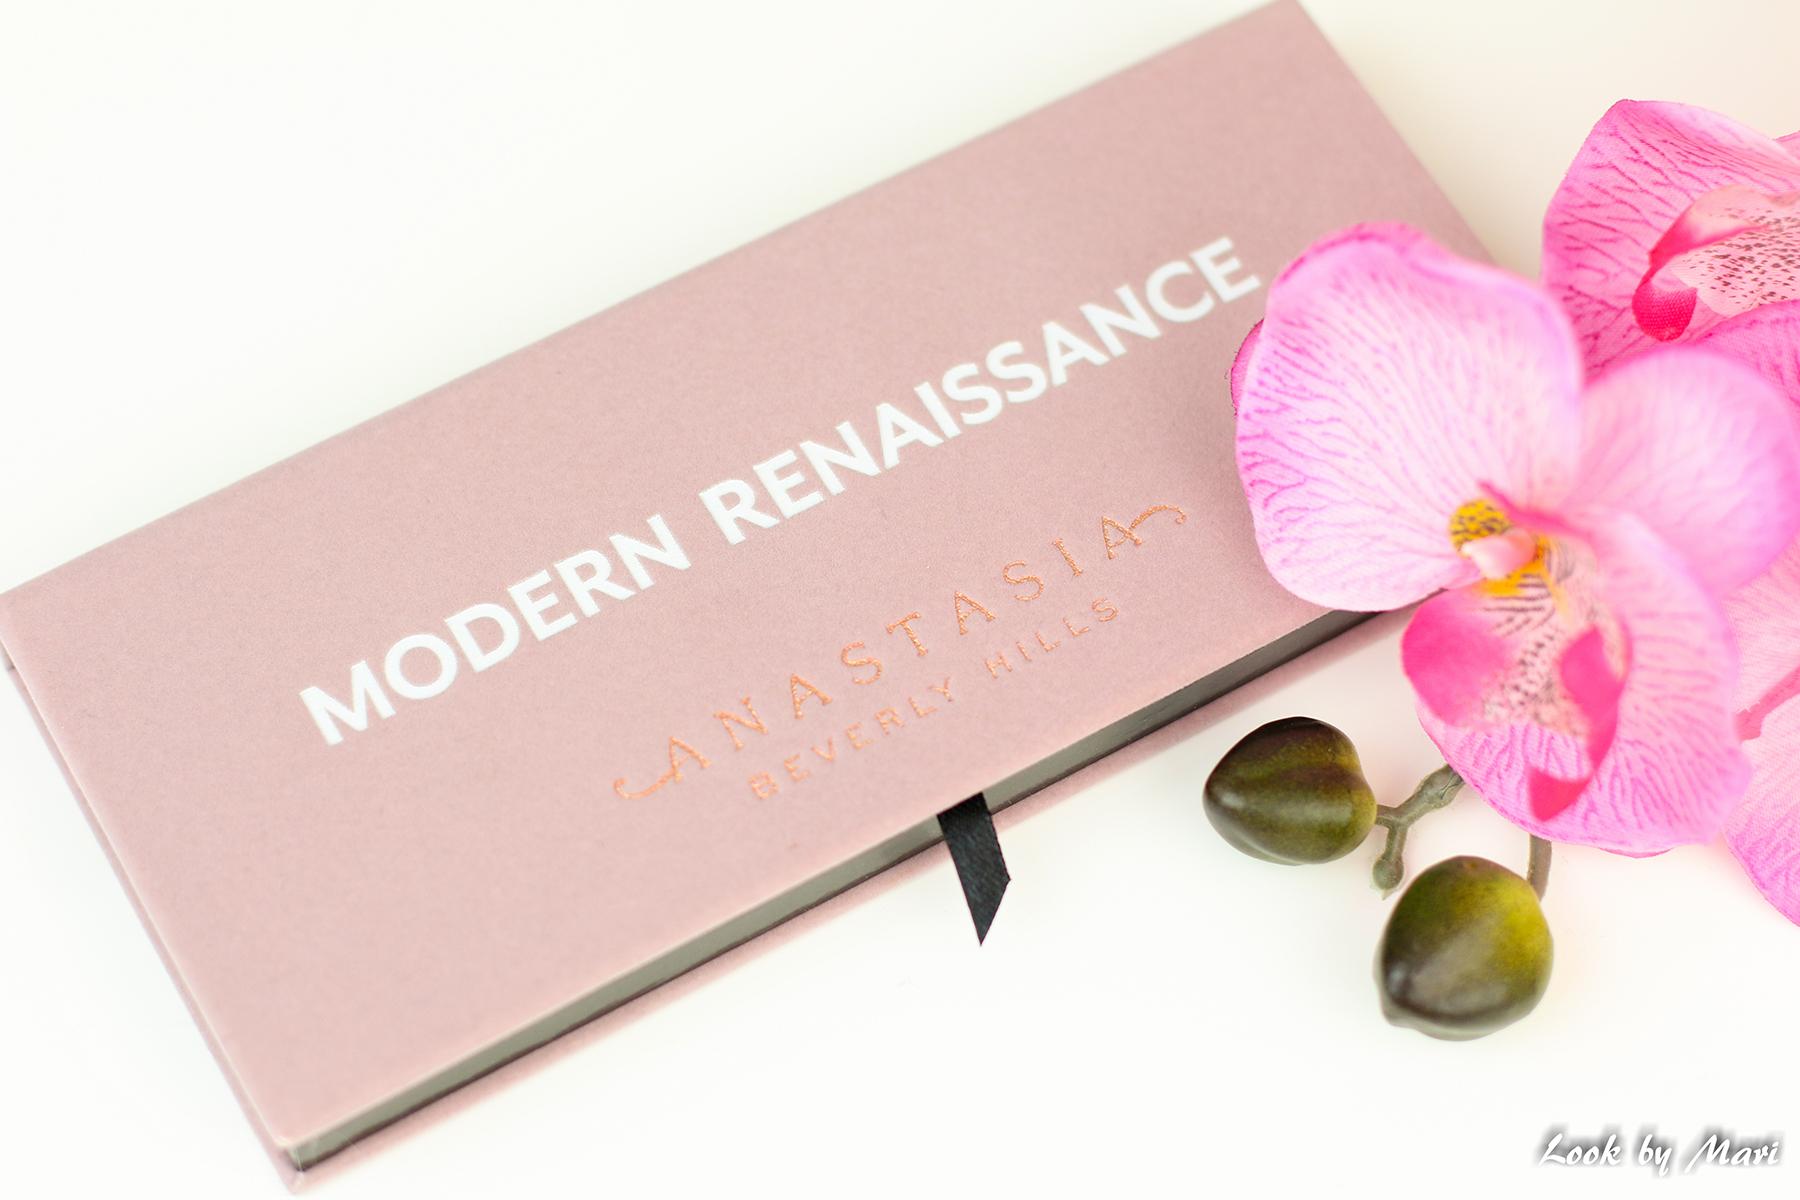 7 abh modern renaissance eyeshadow palette kokemuksia